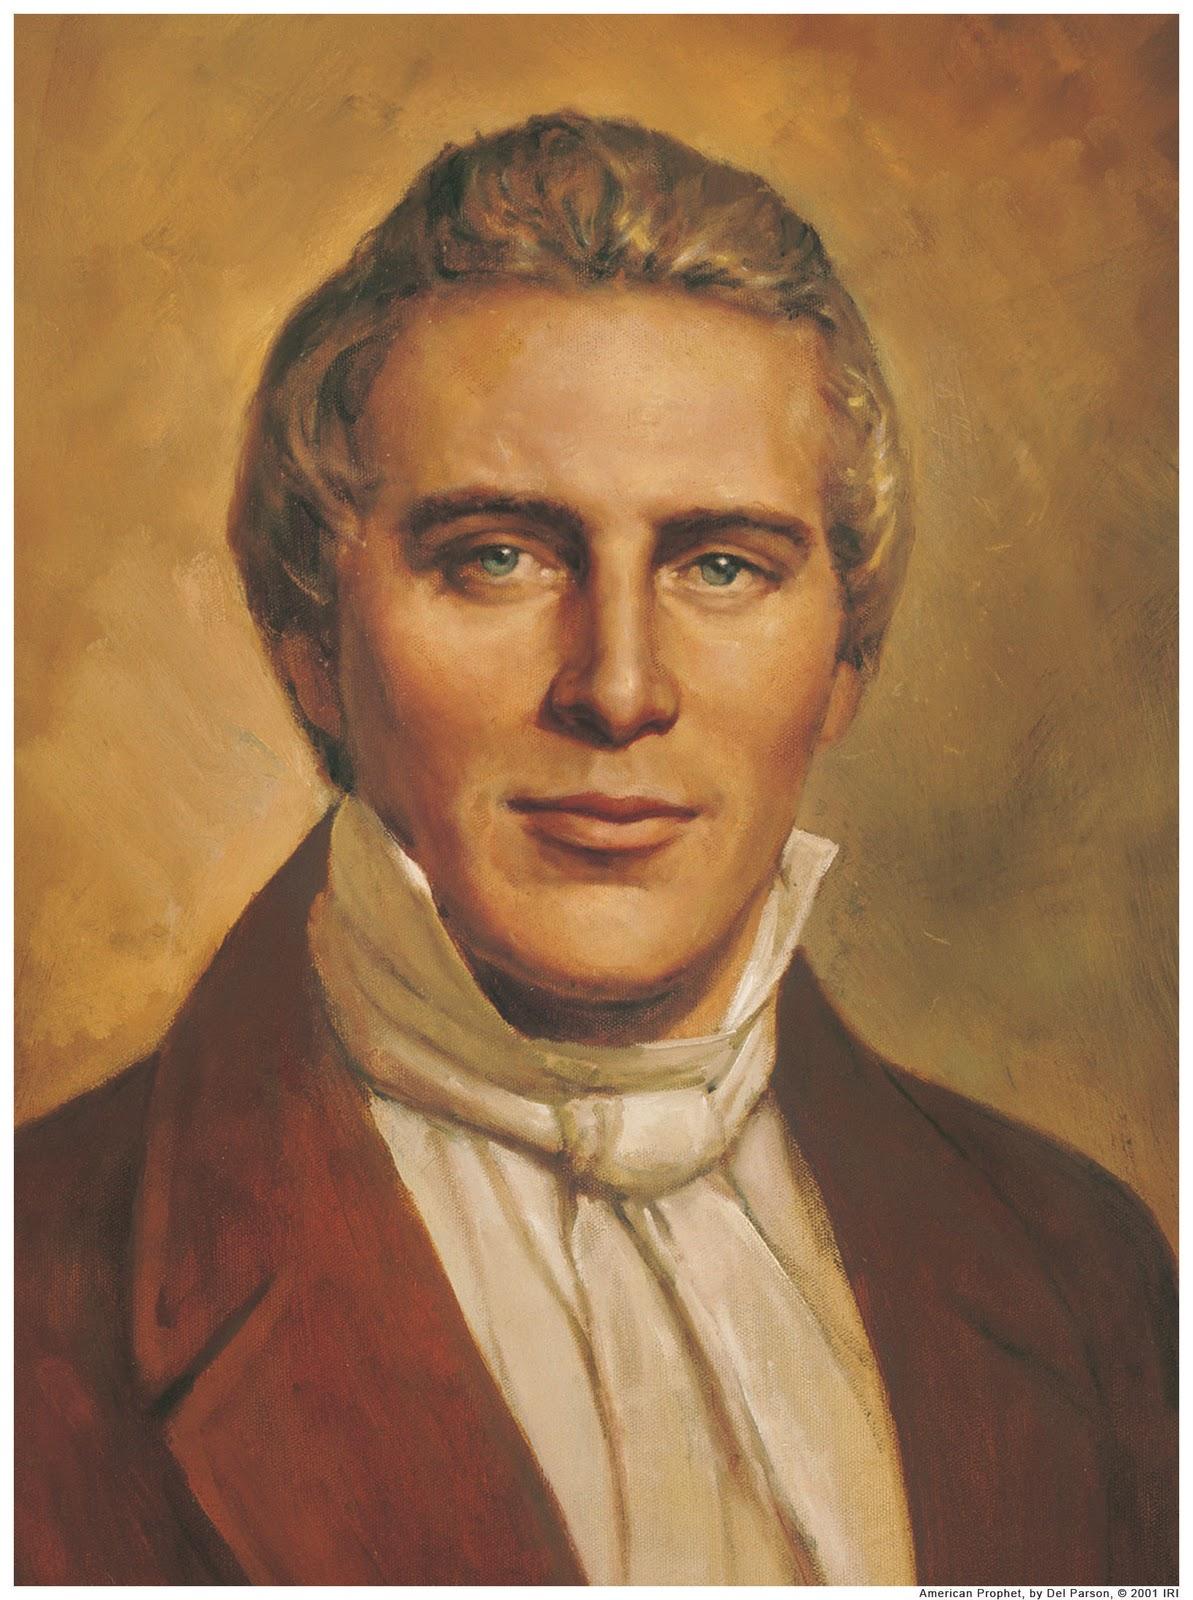 Joseph Smith - Founder of the Mormons